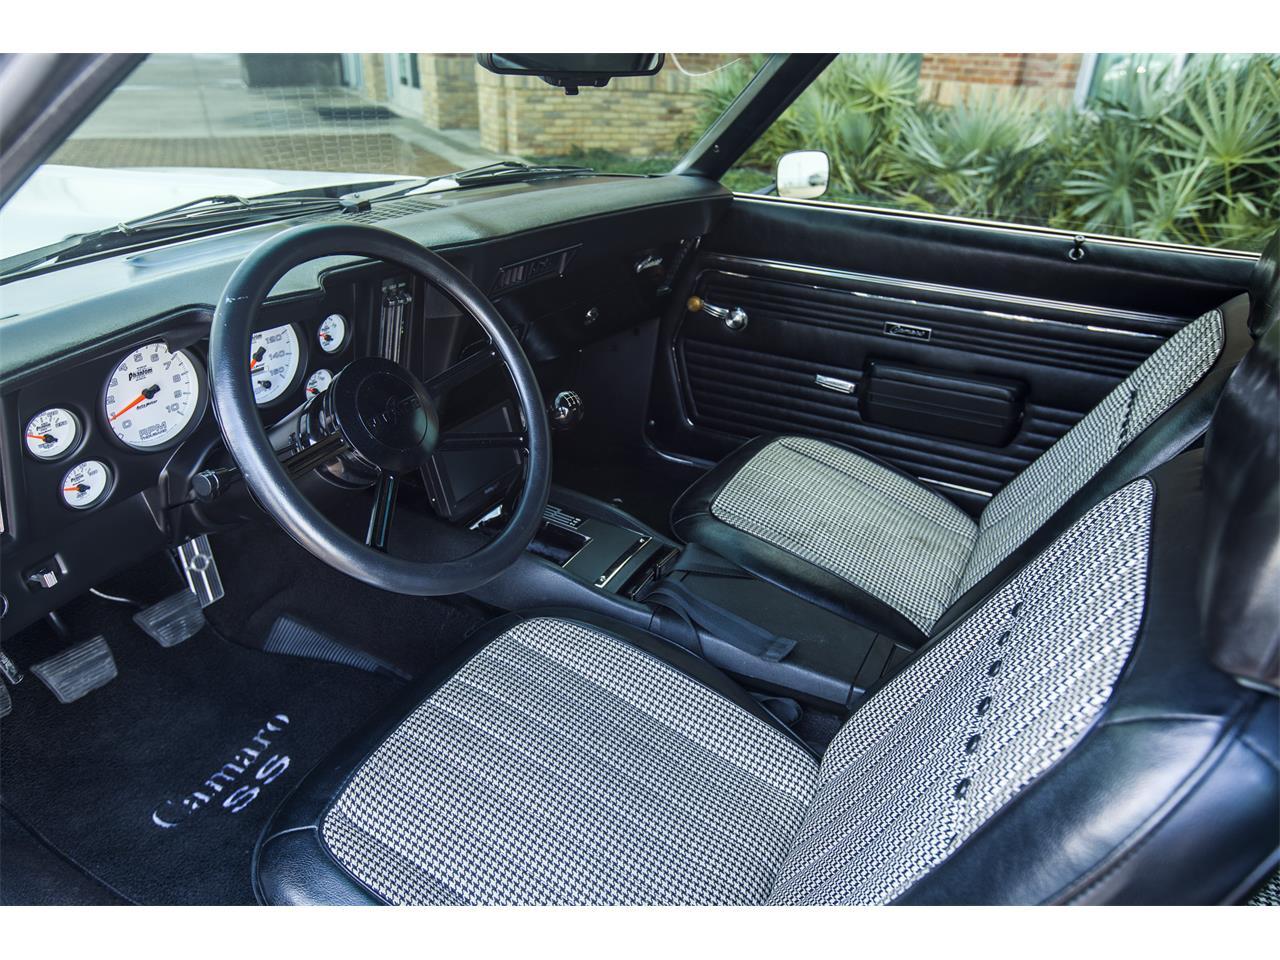 Large Picture of 1969 Camaro located in Florida - $129,900.00 - Q4JB